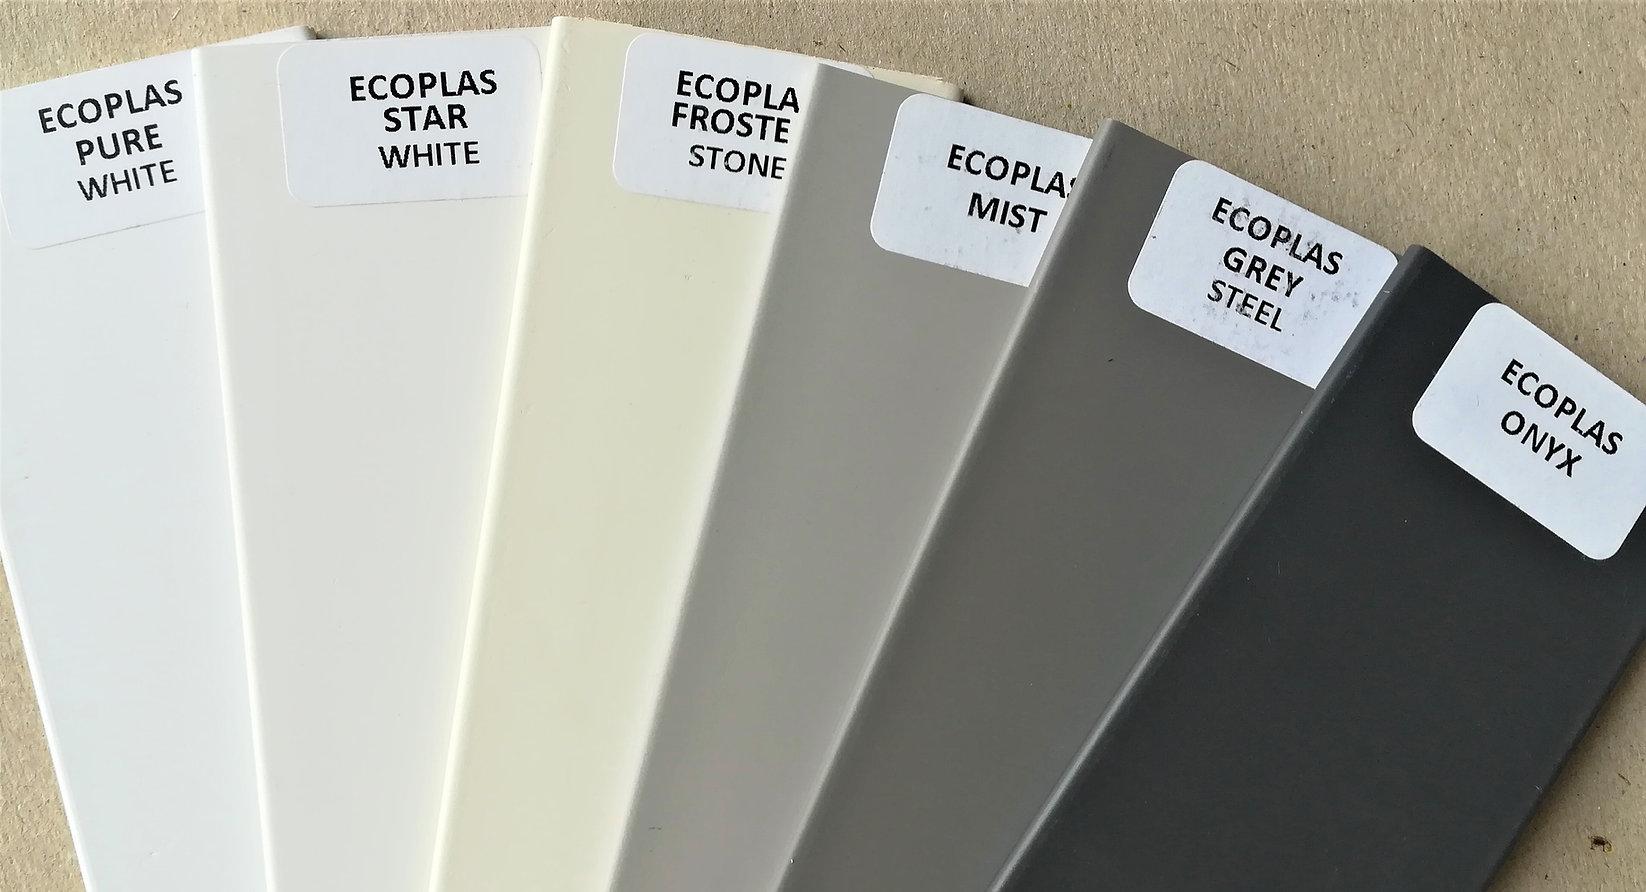 Sasmples for Ecoplas Venetian Blinds. - Blind Specialist